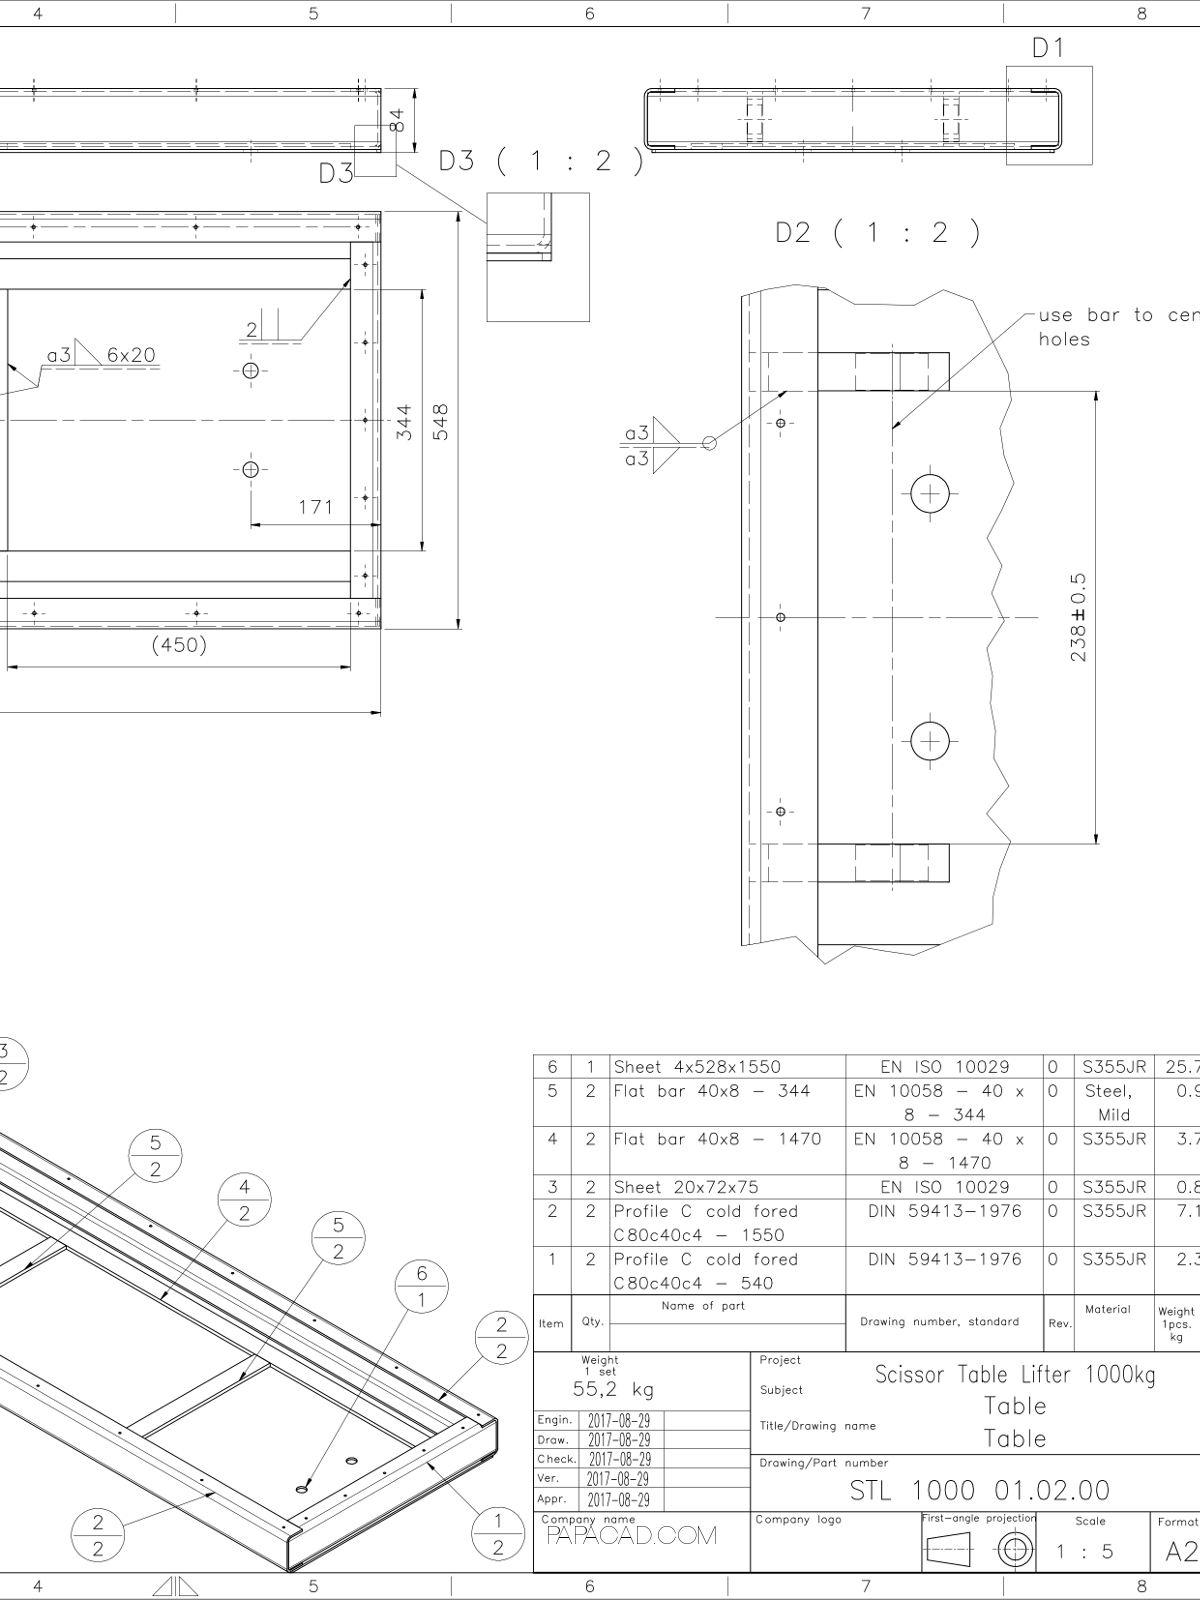 Scissor Table Lift CAD drawings